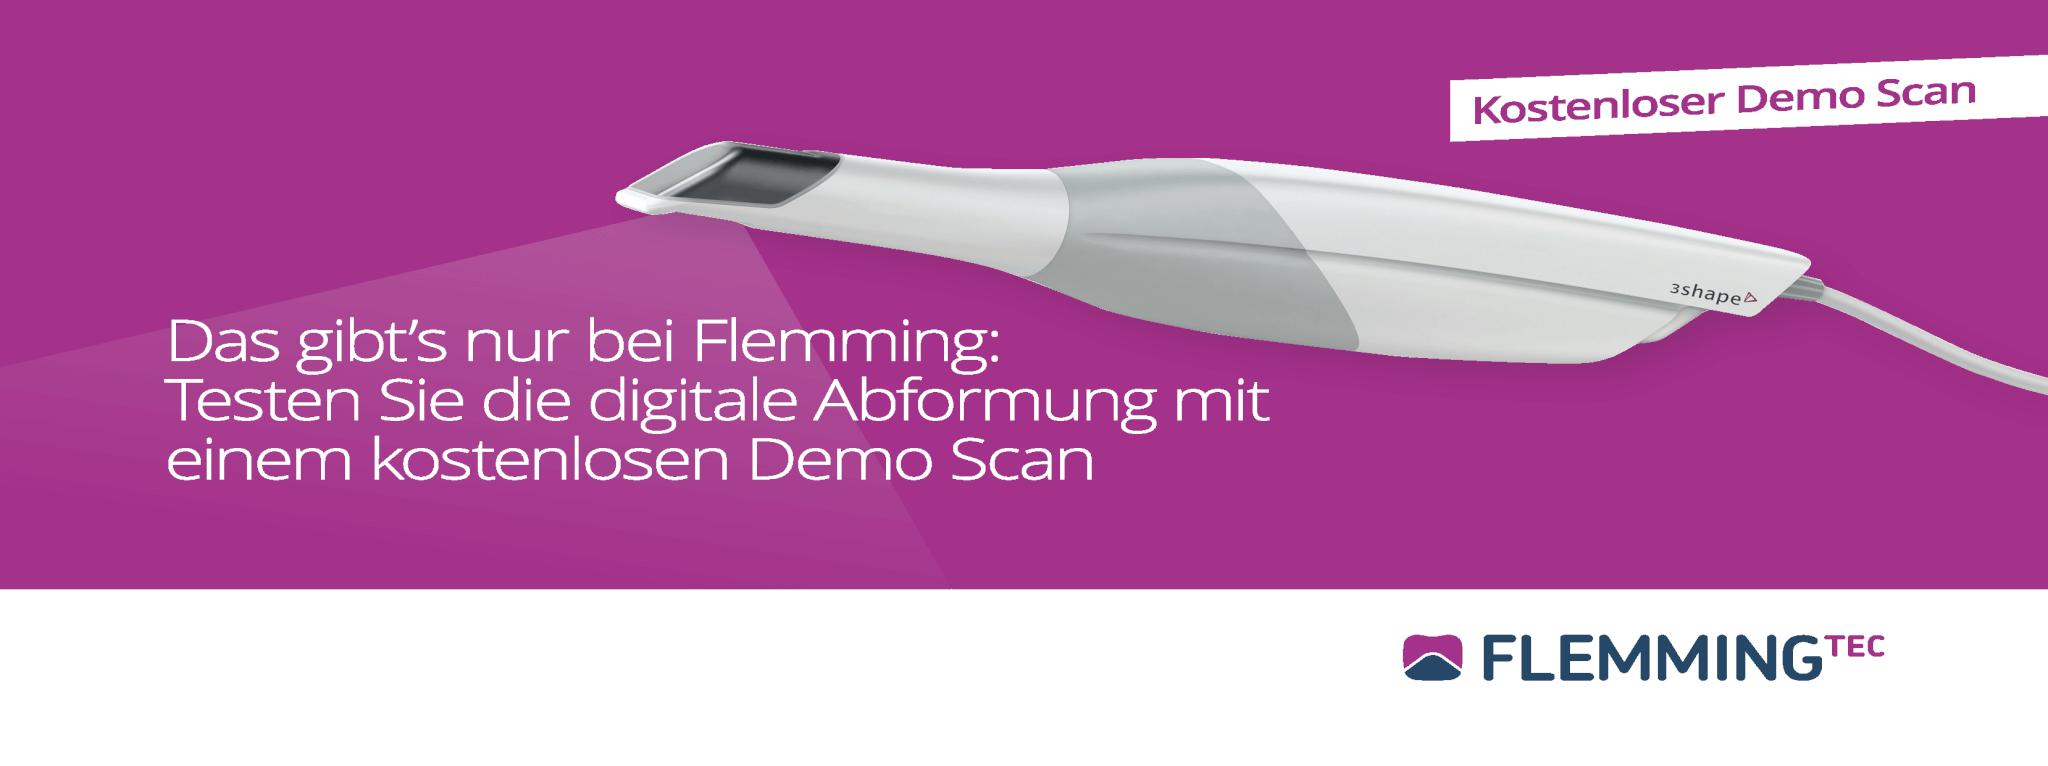 Demo Scan mit Flemming